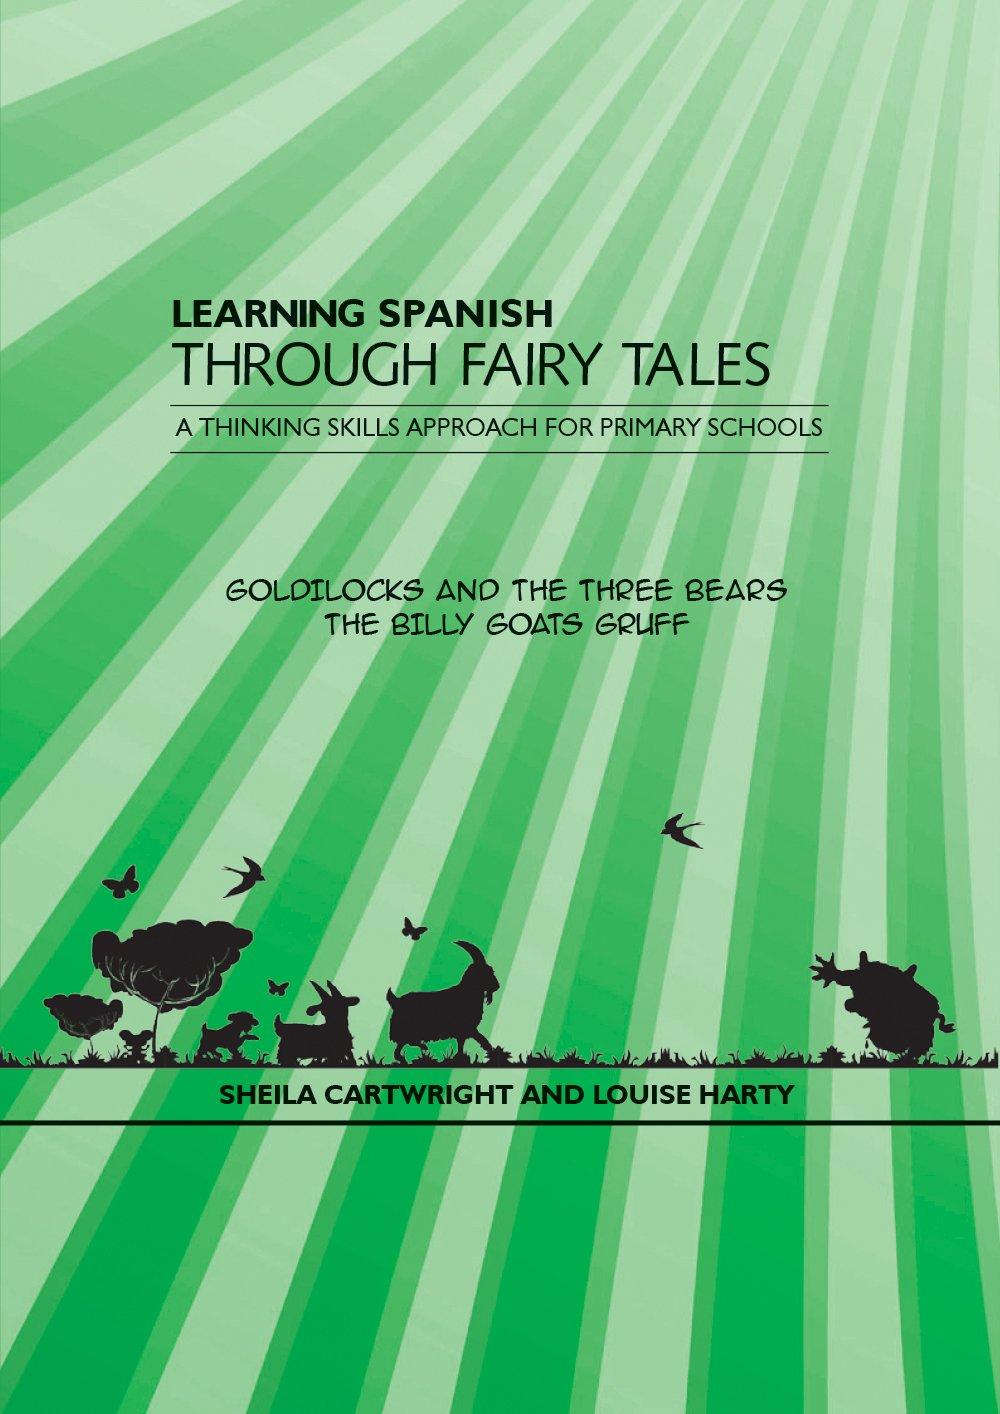 Learning Spanish through Fairy Tales